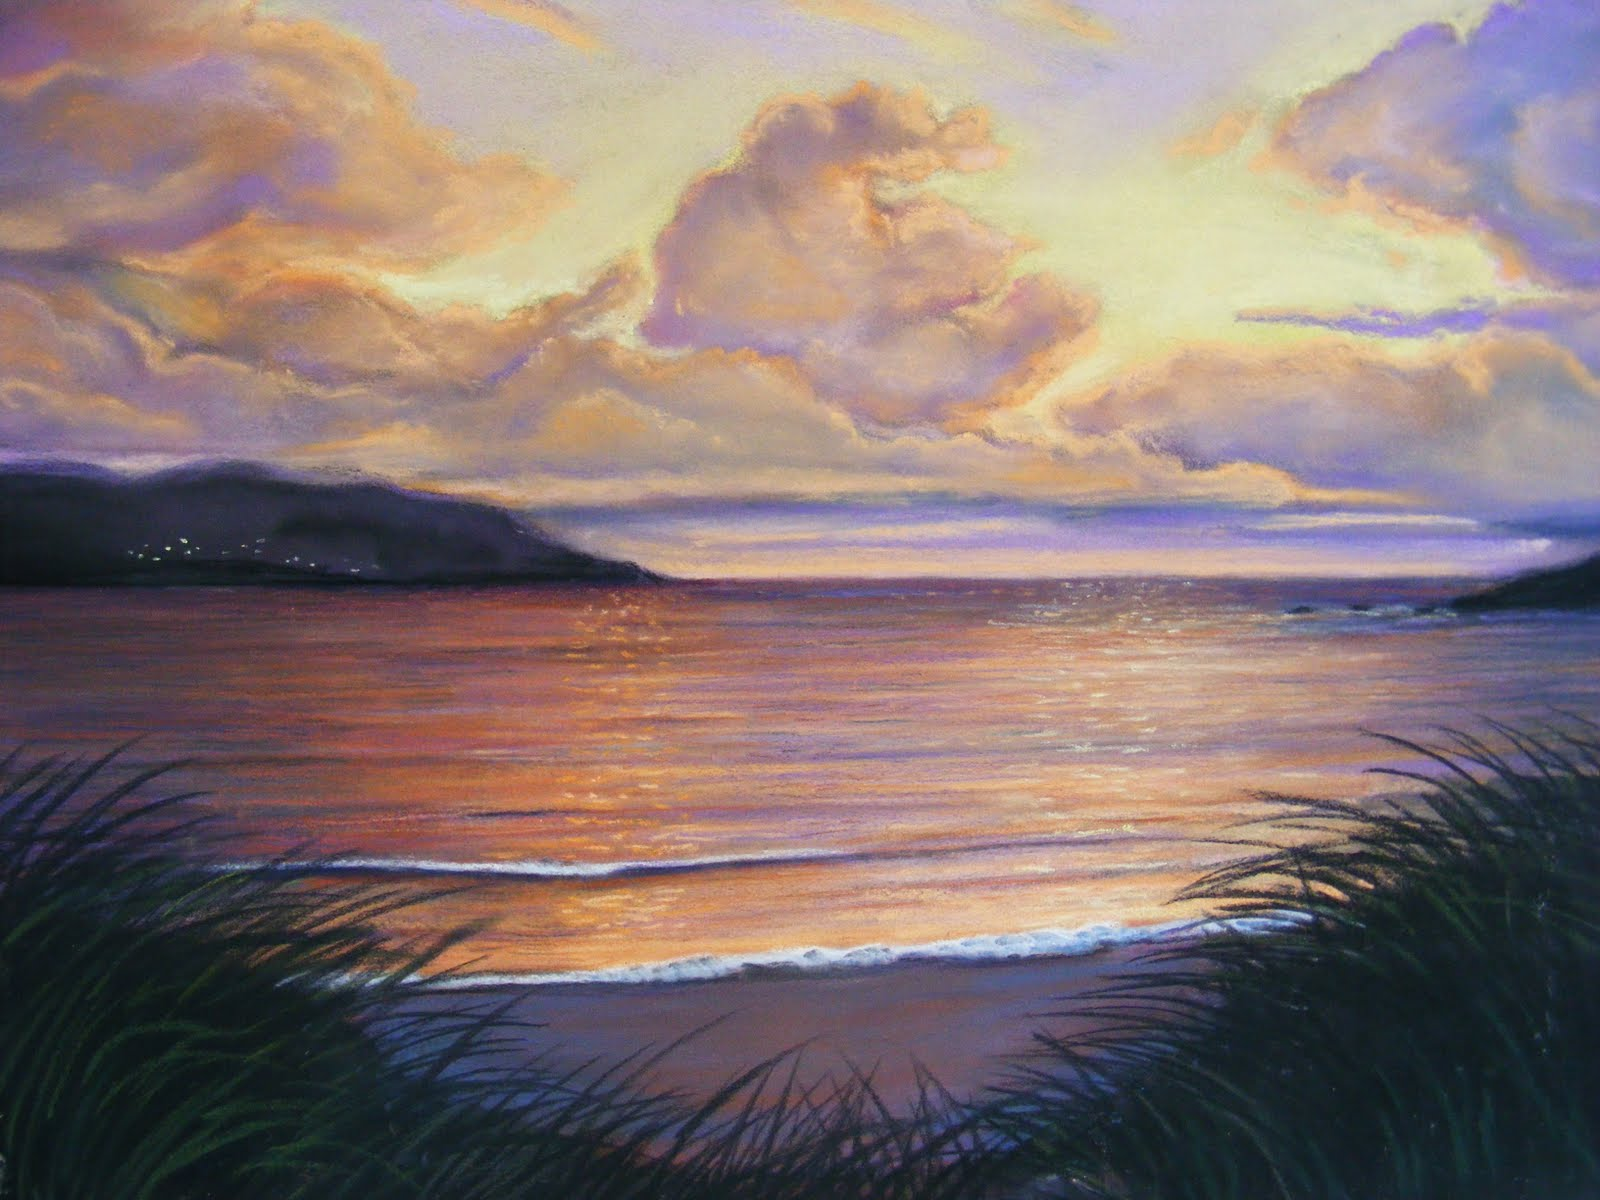 Deborah O 39 Keeffe Paintings Of Ireland November 2009